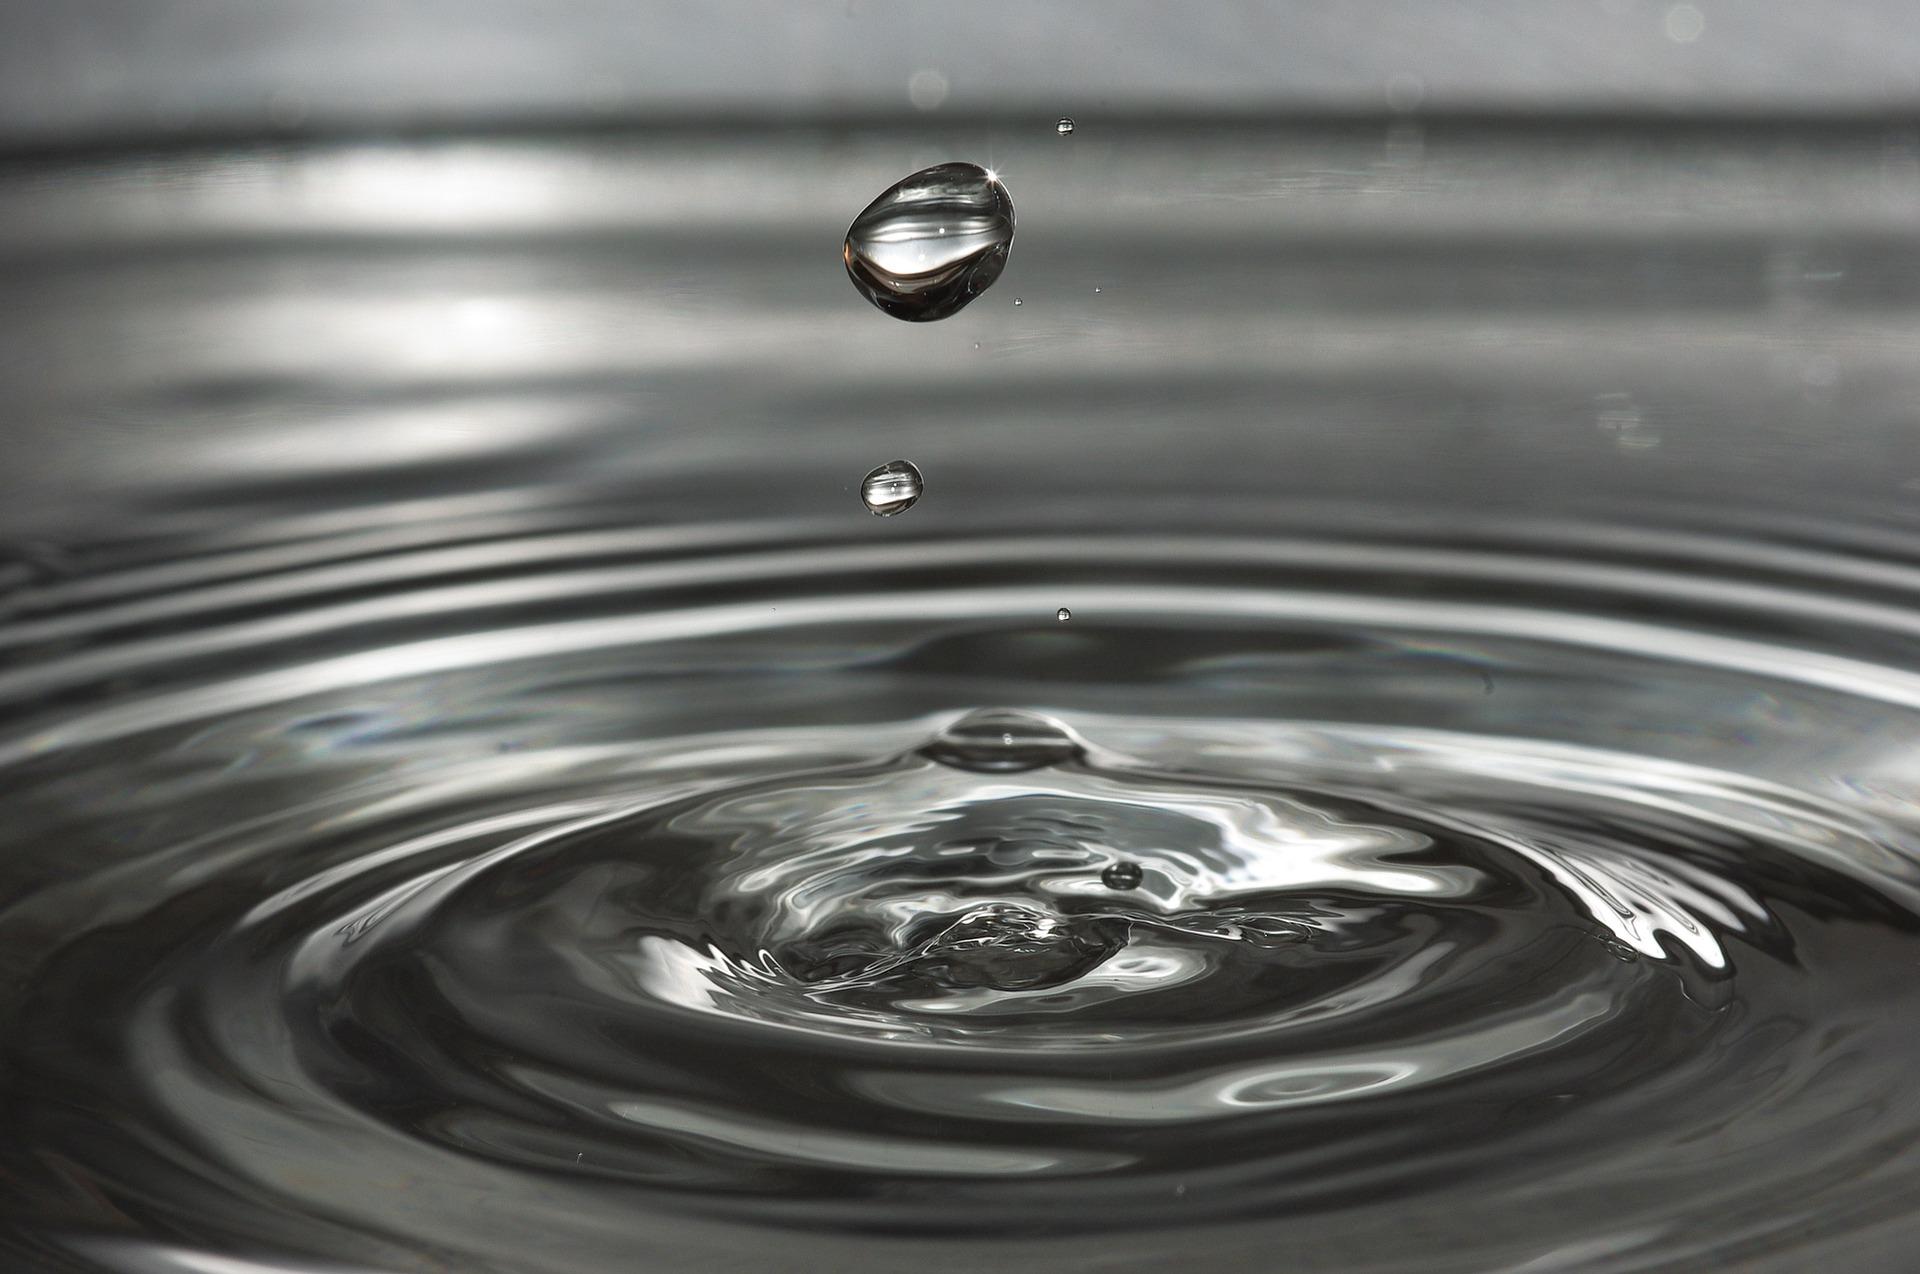 la caduta di una goccia in una distesa d'acqua genera una serie di cerchi concentrici